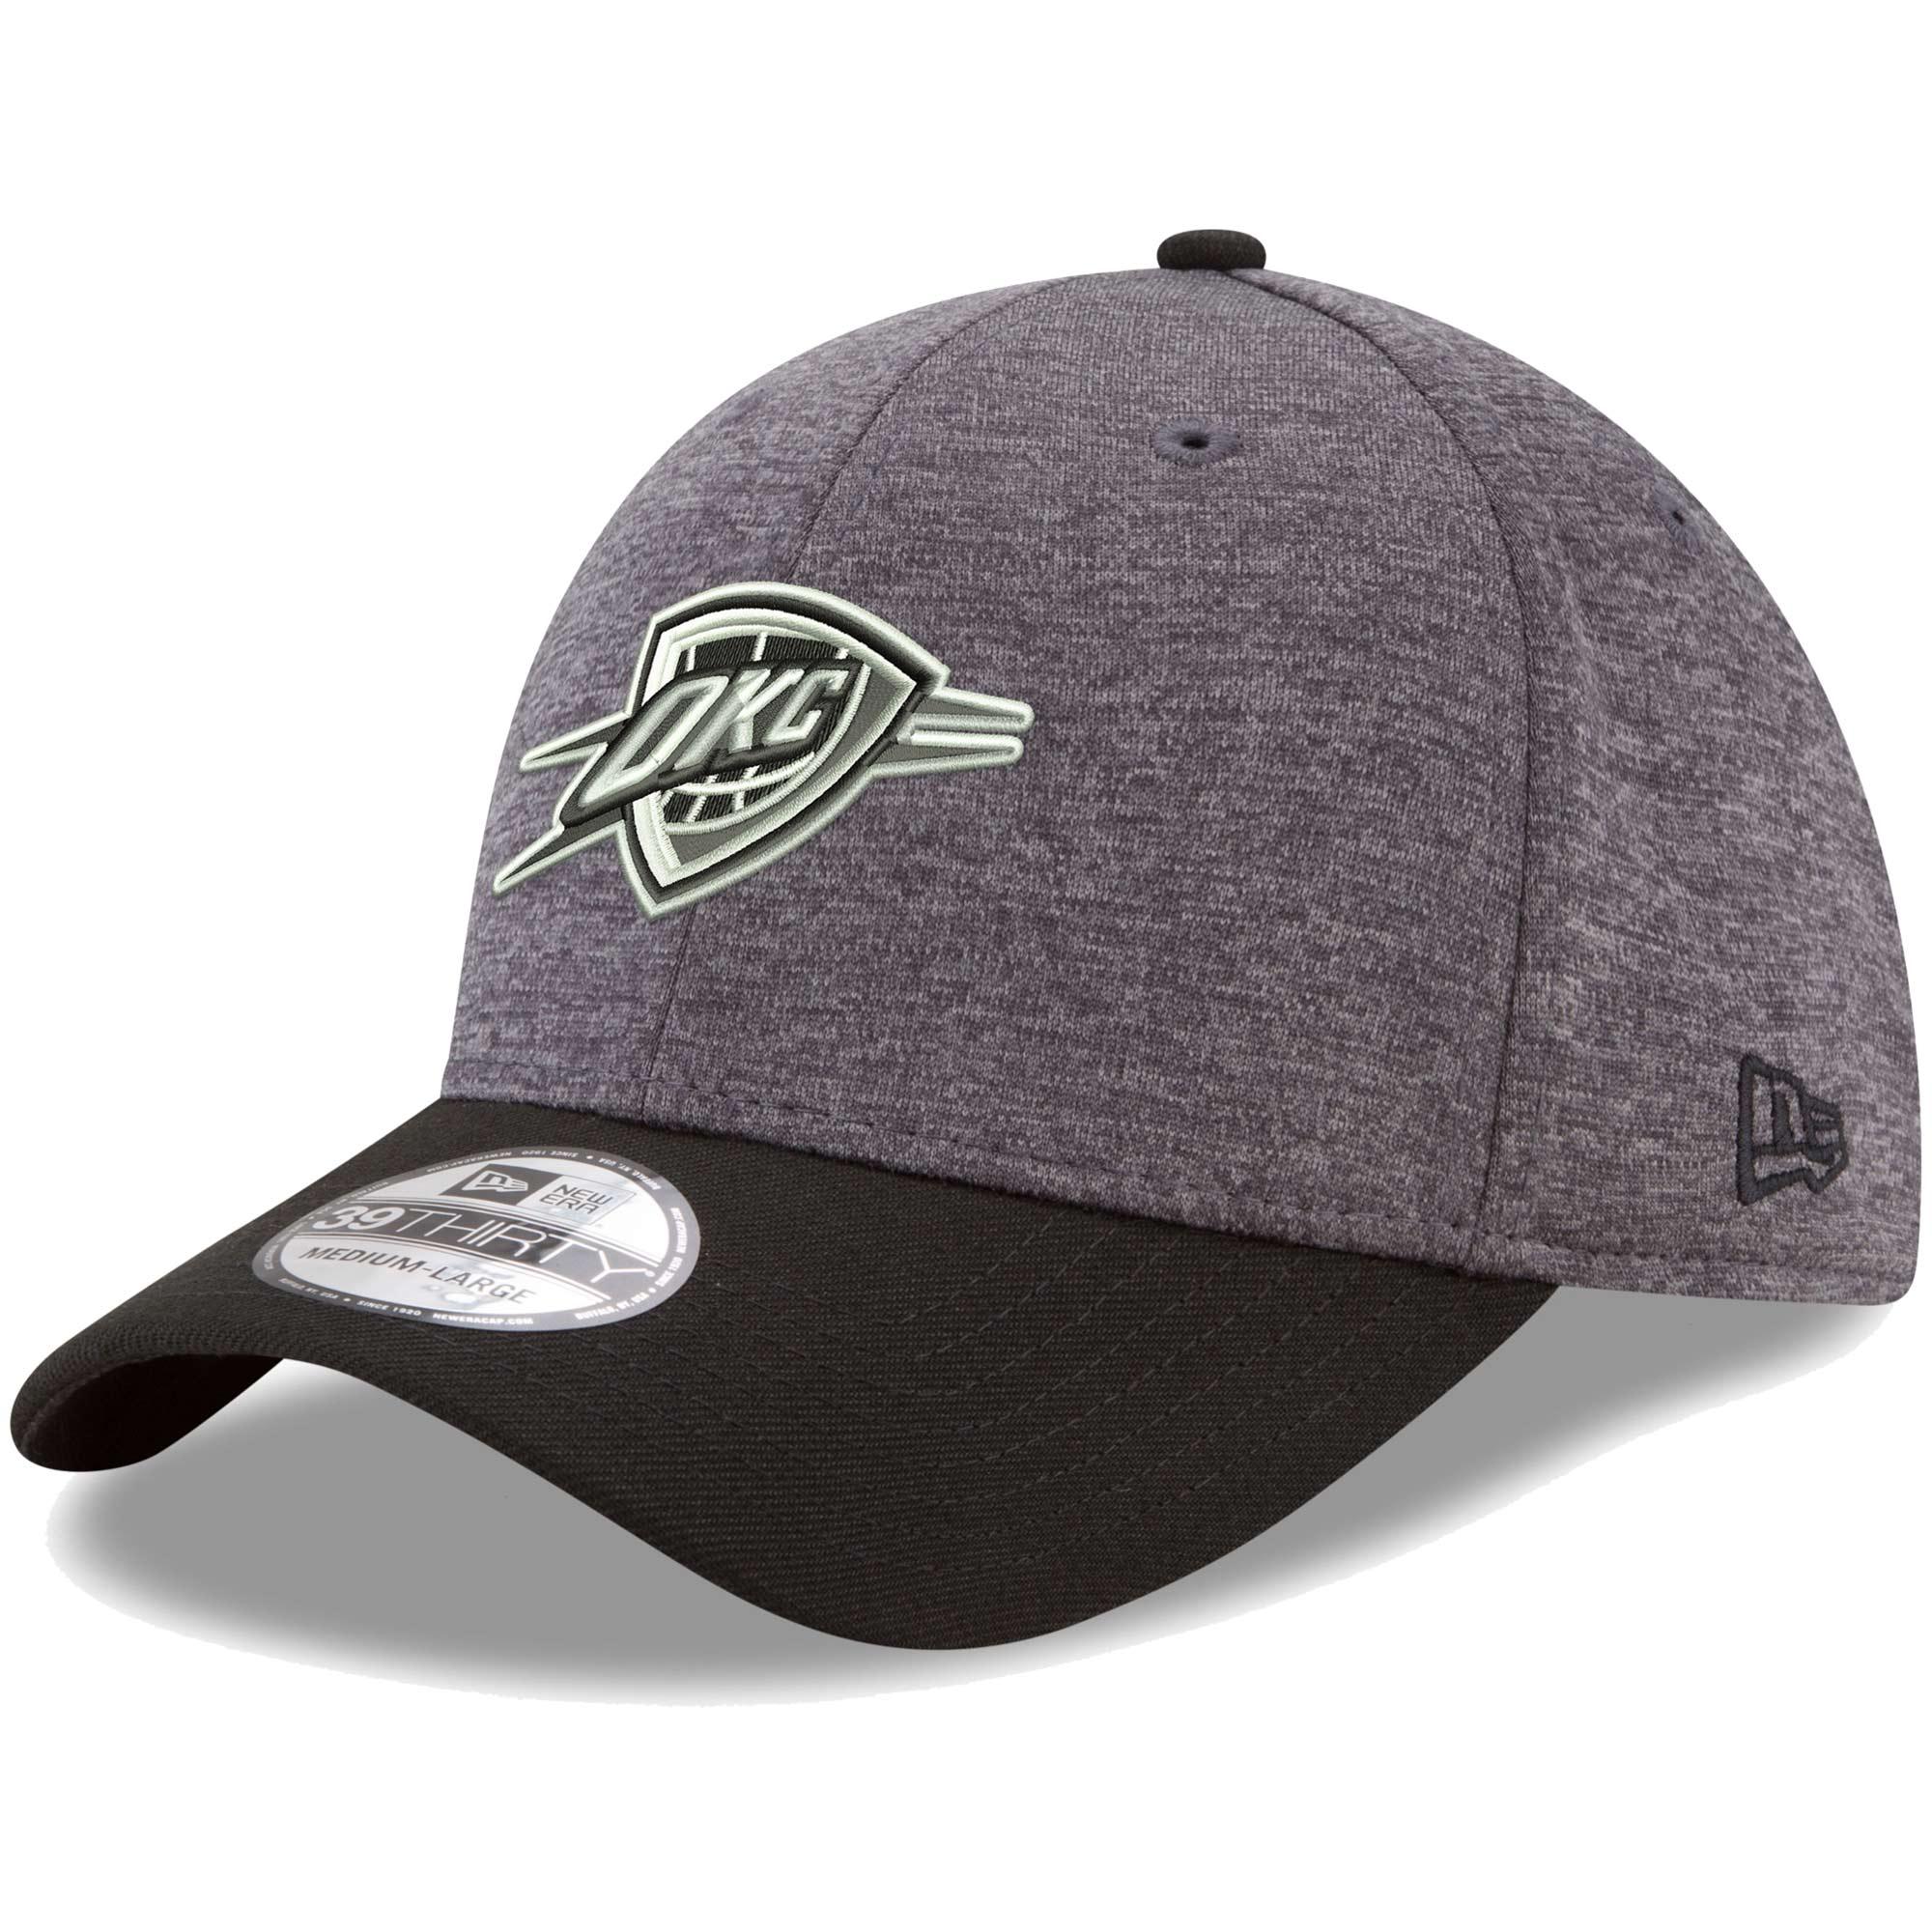 Oklahoma City Thunder New Era 39THIRTY Flex Hat - Heathered Gray/Black